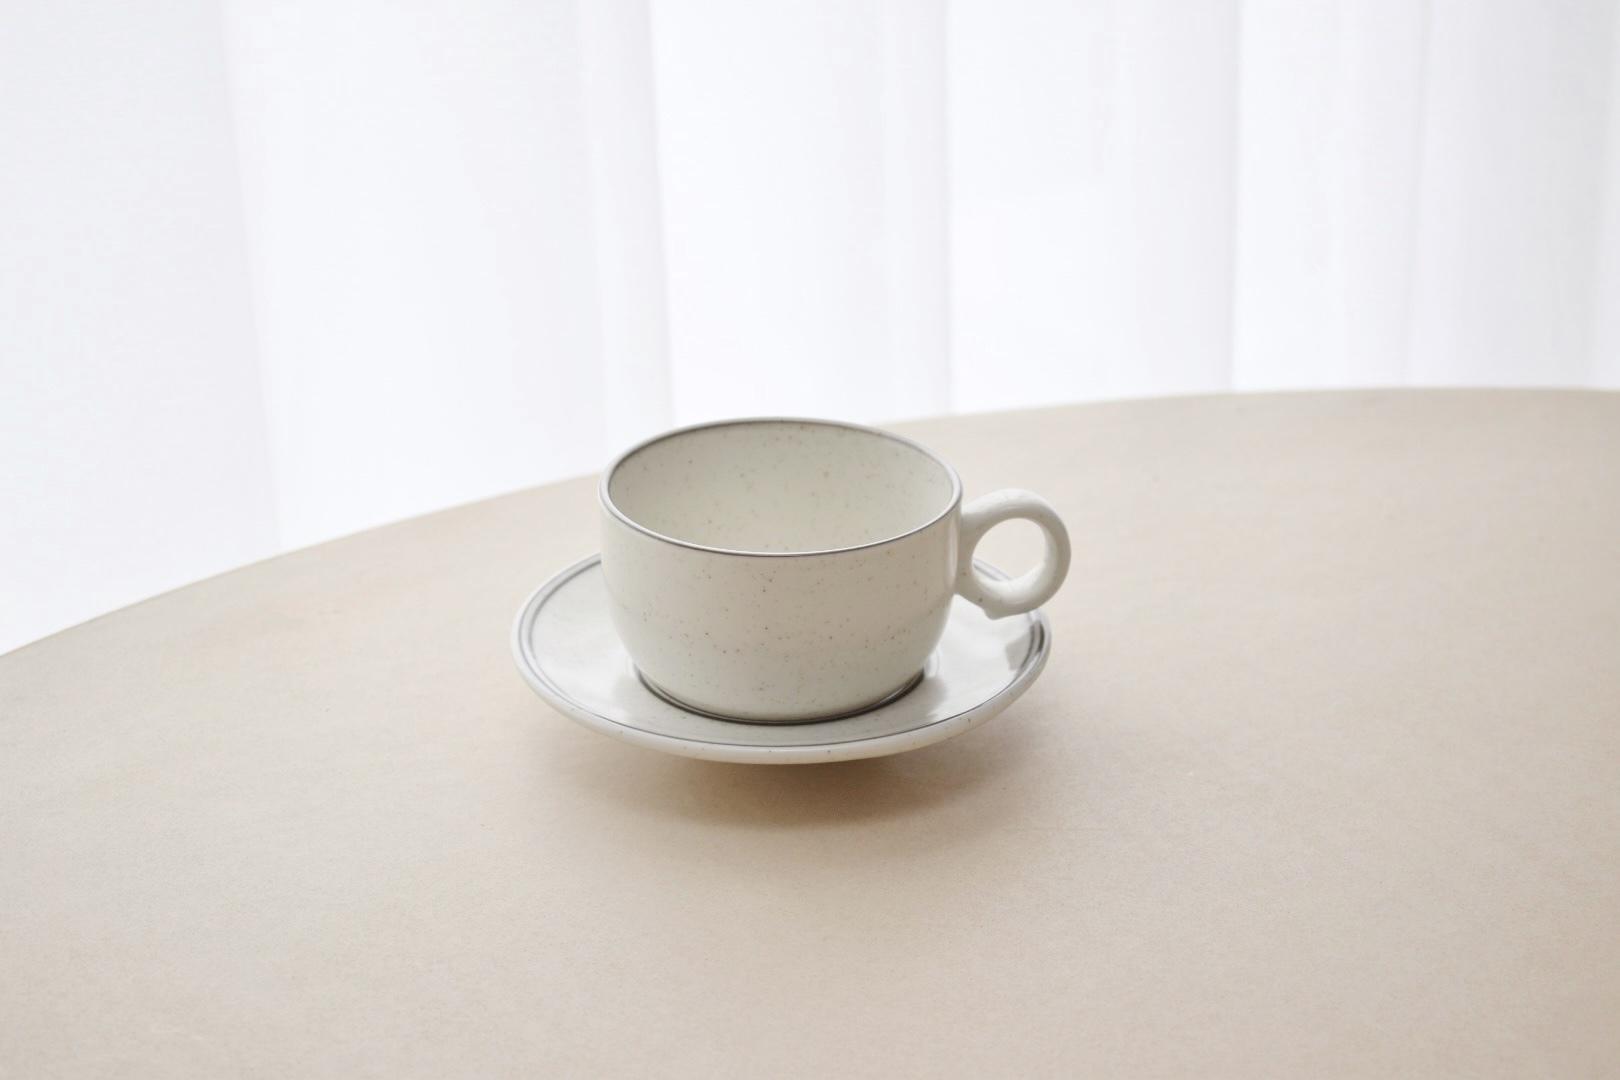 arabia Birka coffee c&s(Stig Lindberg)